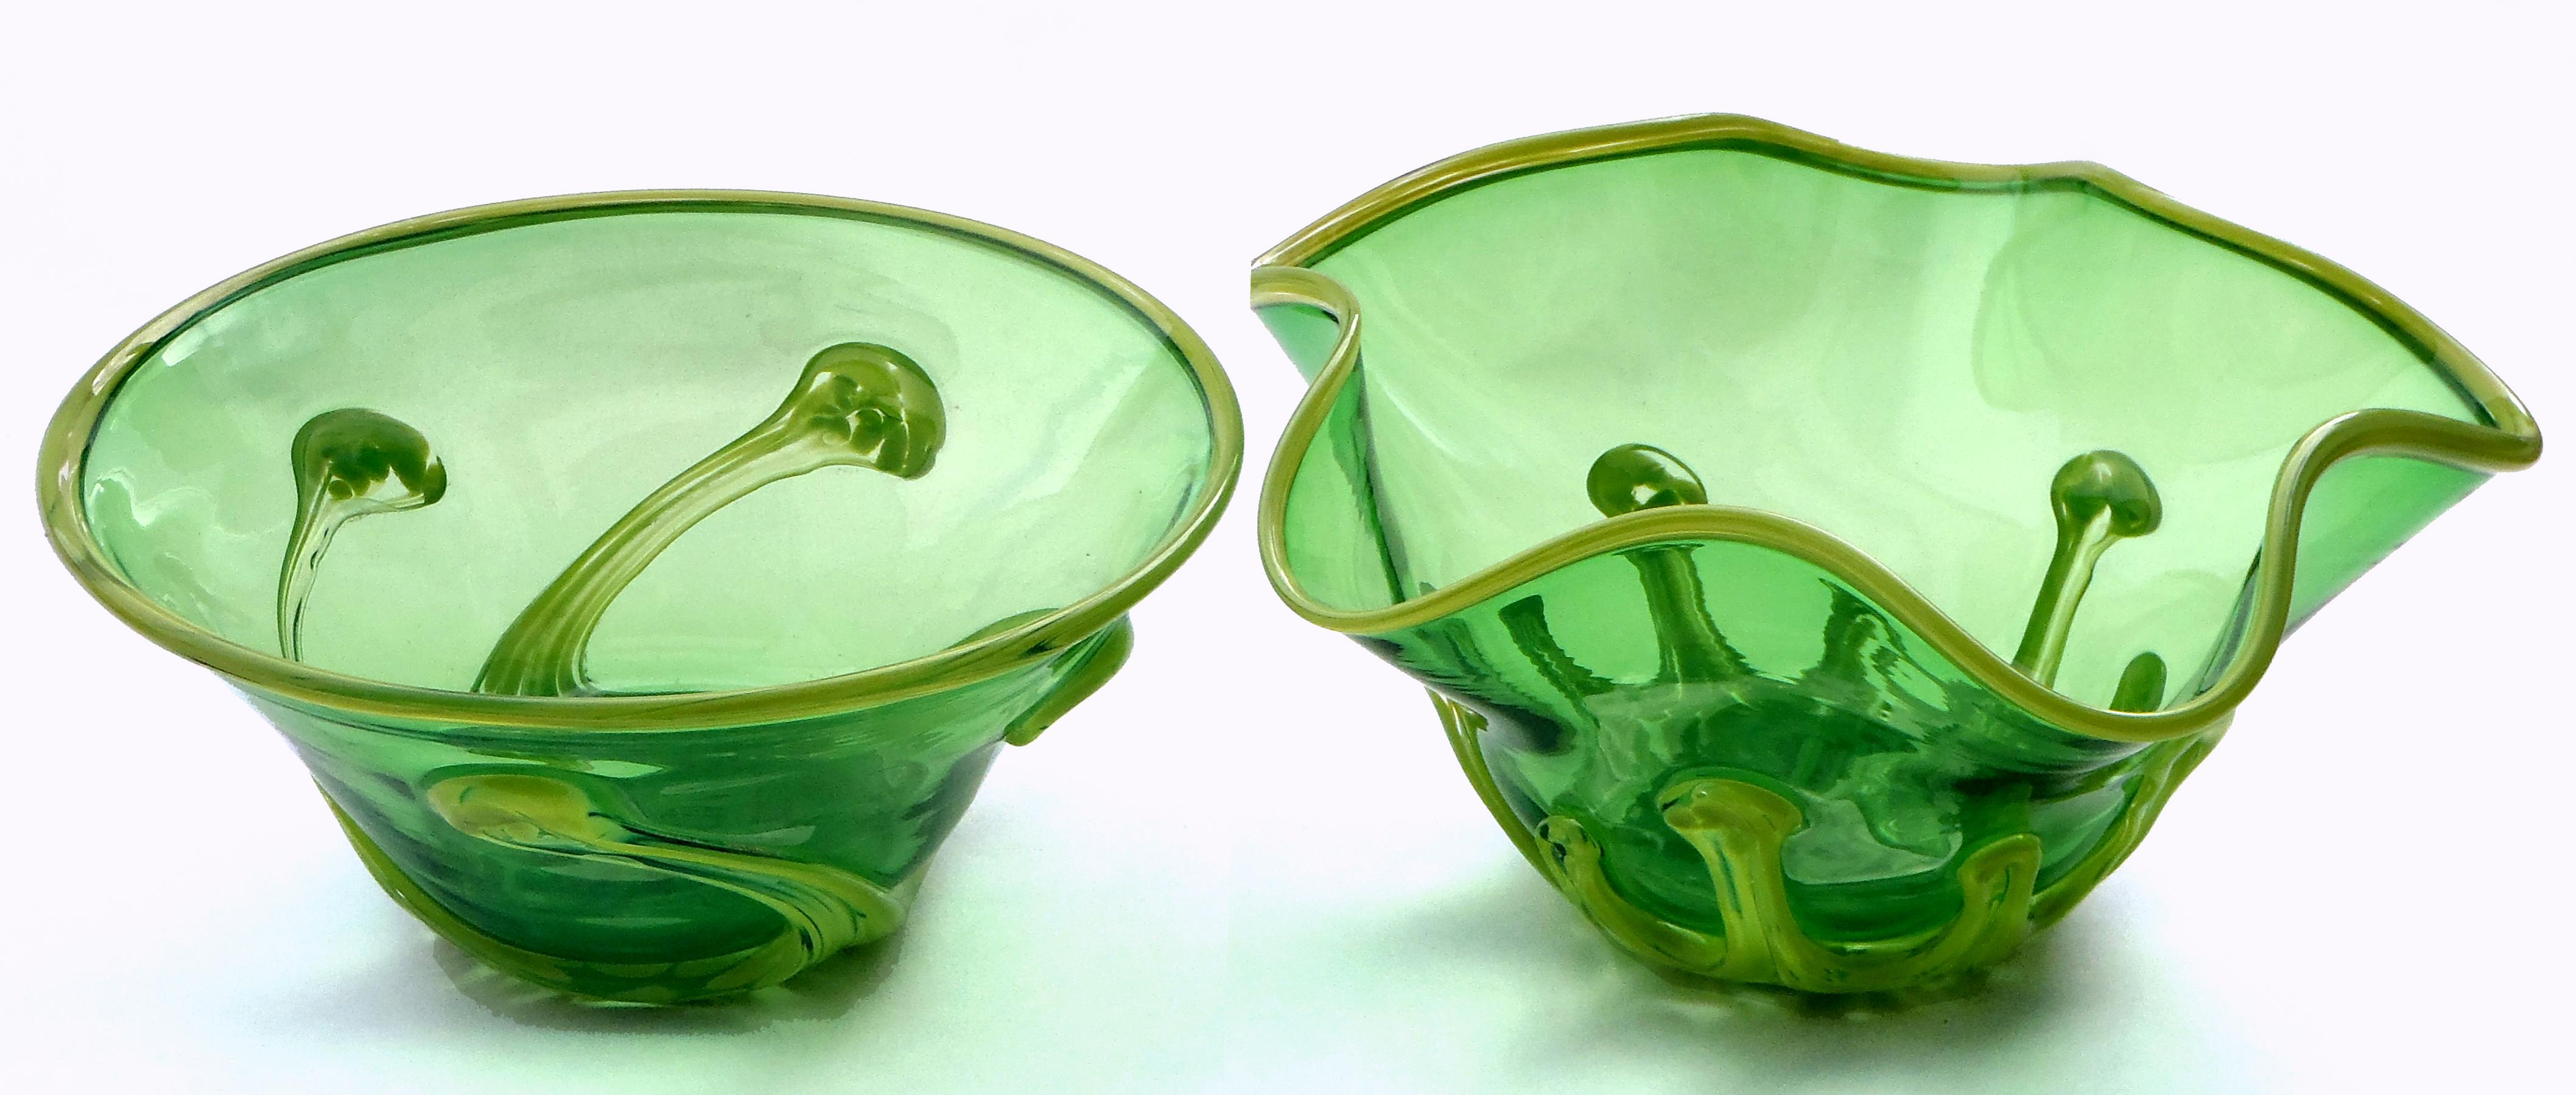 green yellow metallic vessel